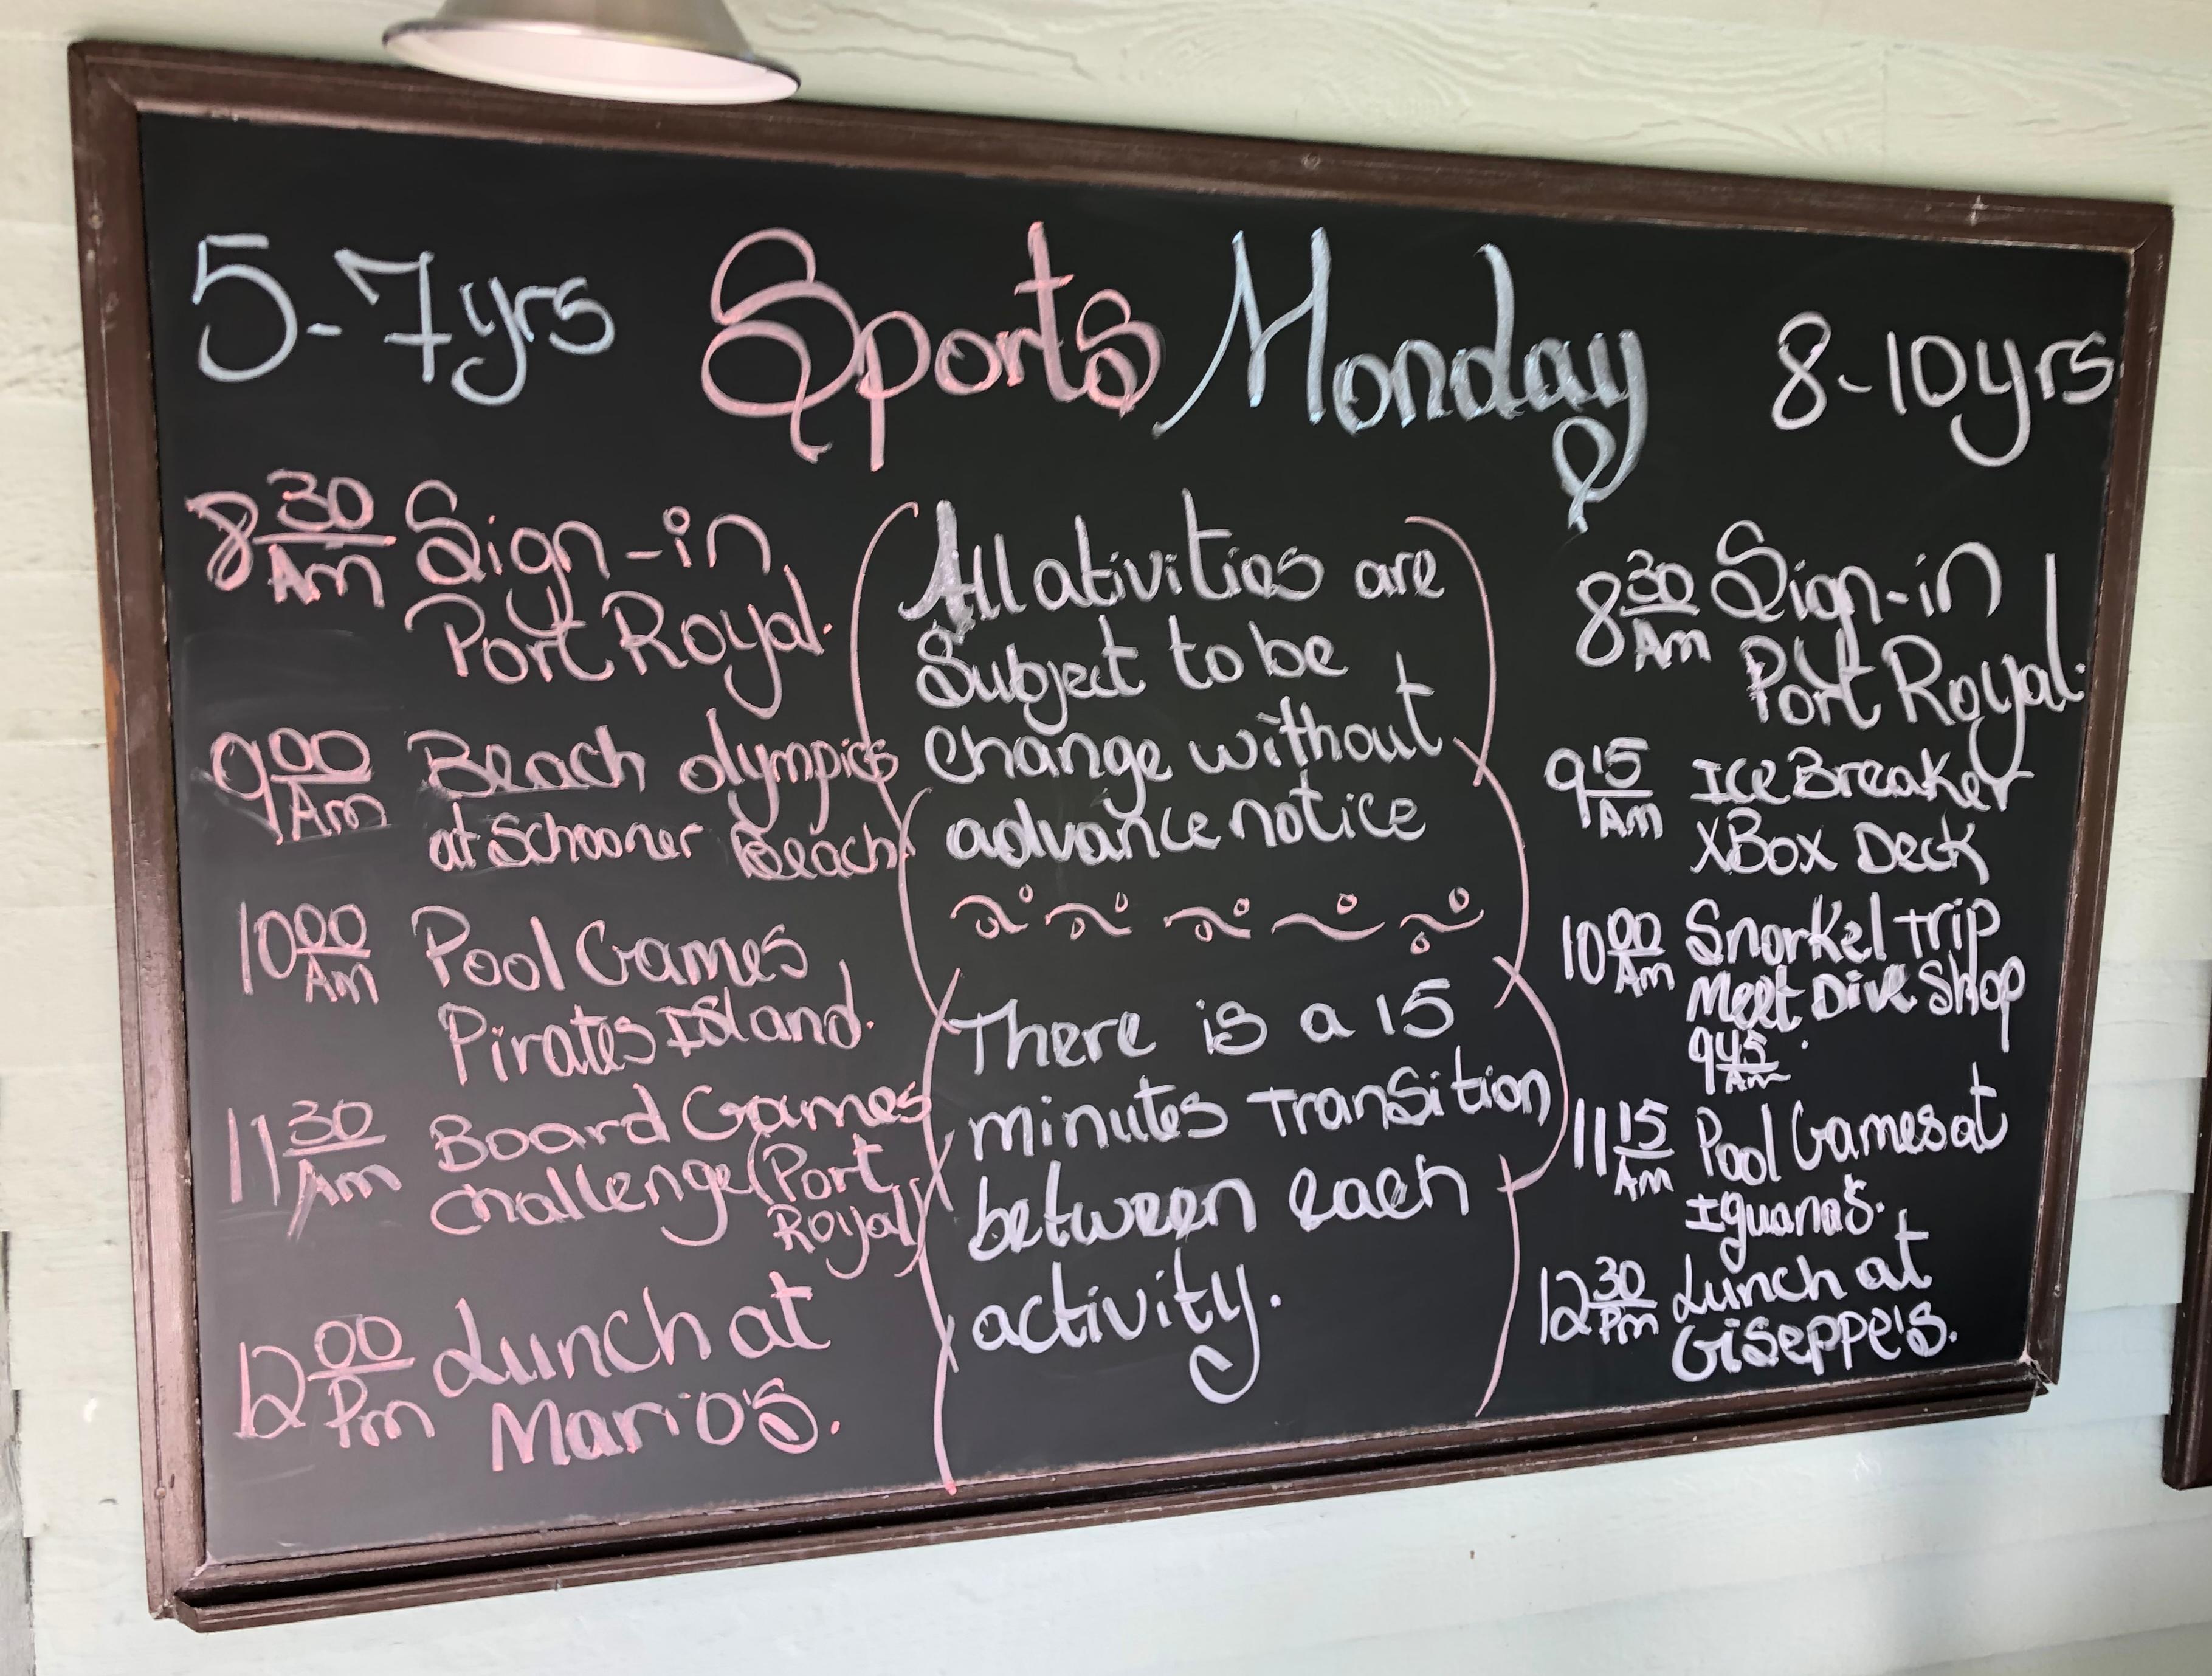 Beaches Kids Club Schedule